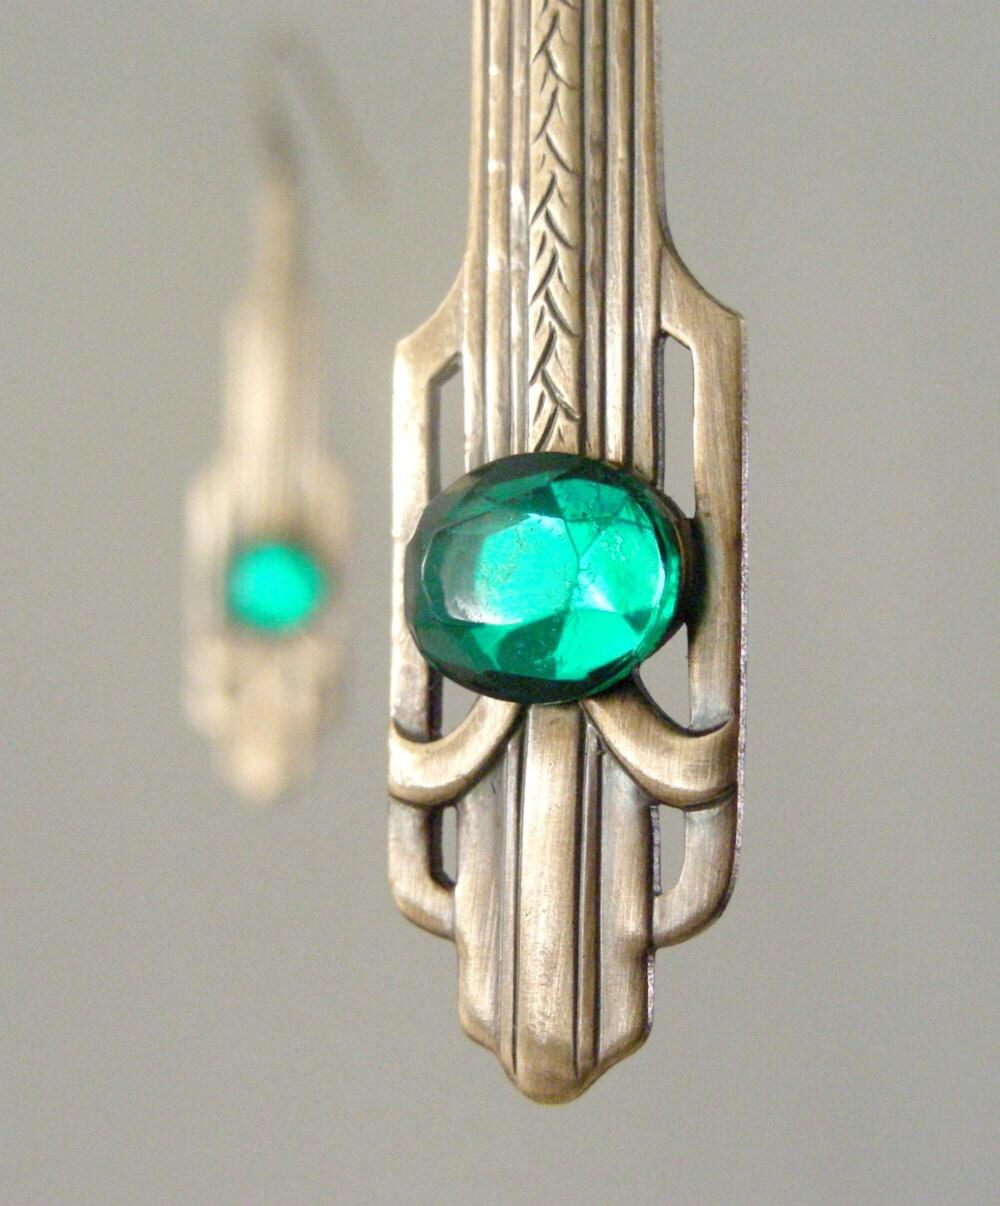 Art Deco Earrings - Vintage Earrings - Green Earrings - Brass Earrings - Emerald Green Earrings - May Birthstone - handmade